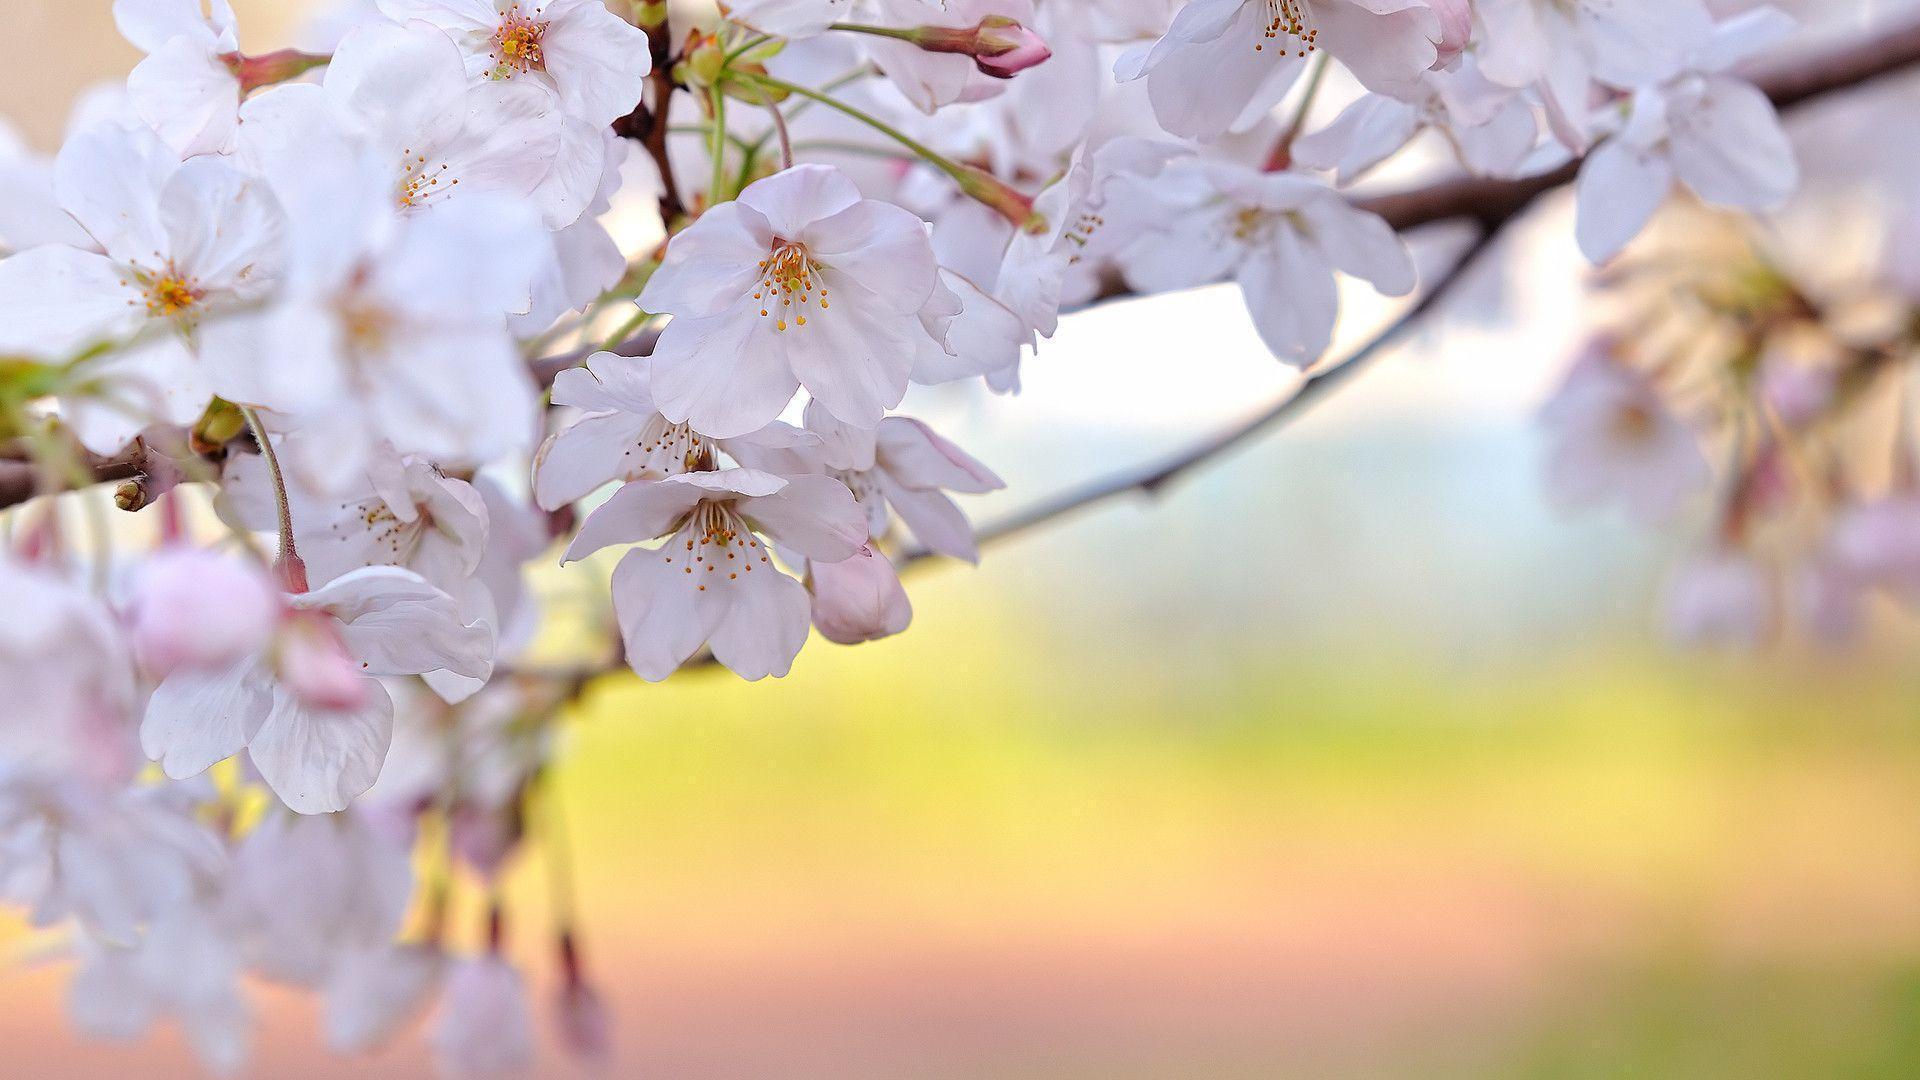 Sakura Flower HD Wallpaper Pics